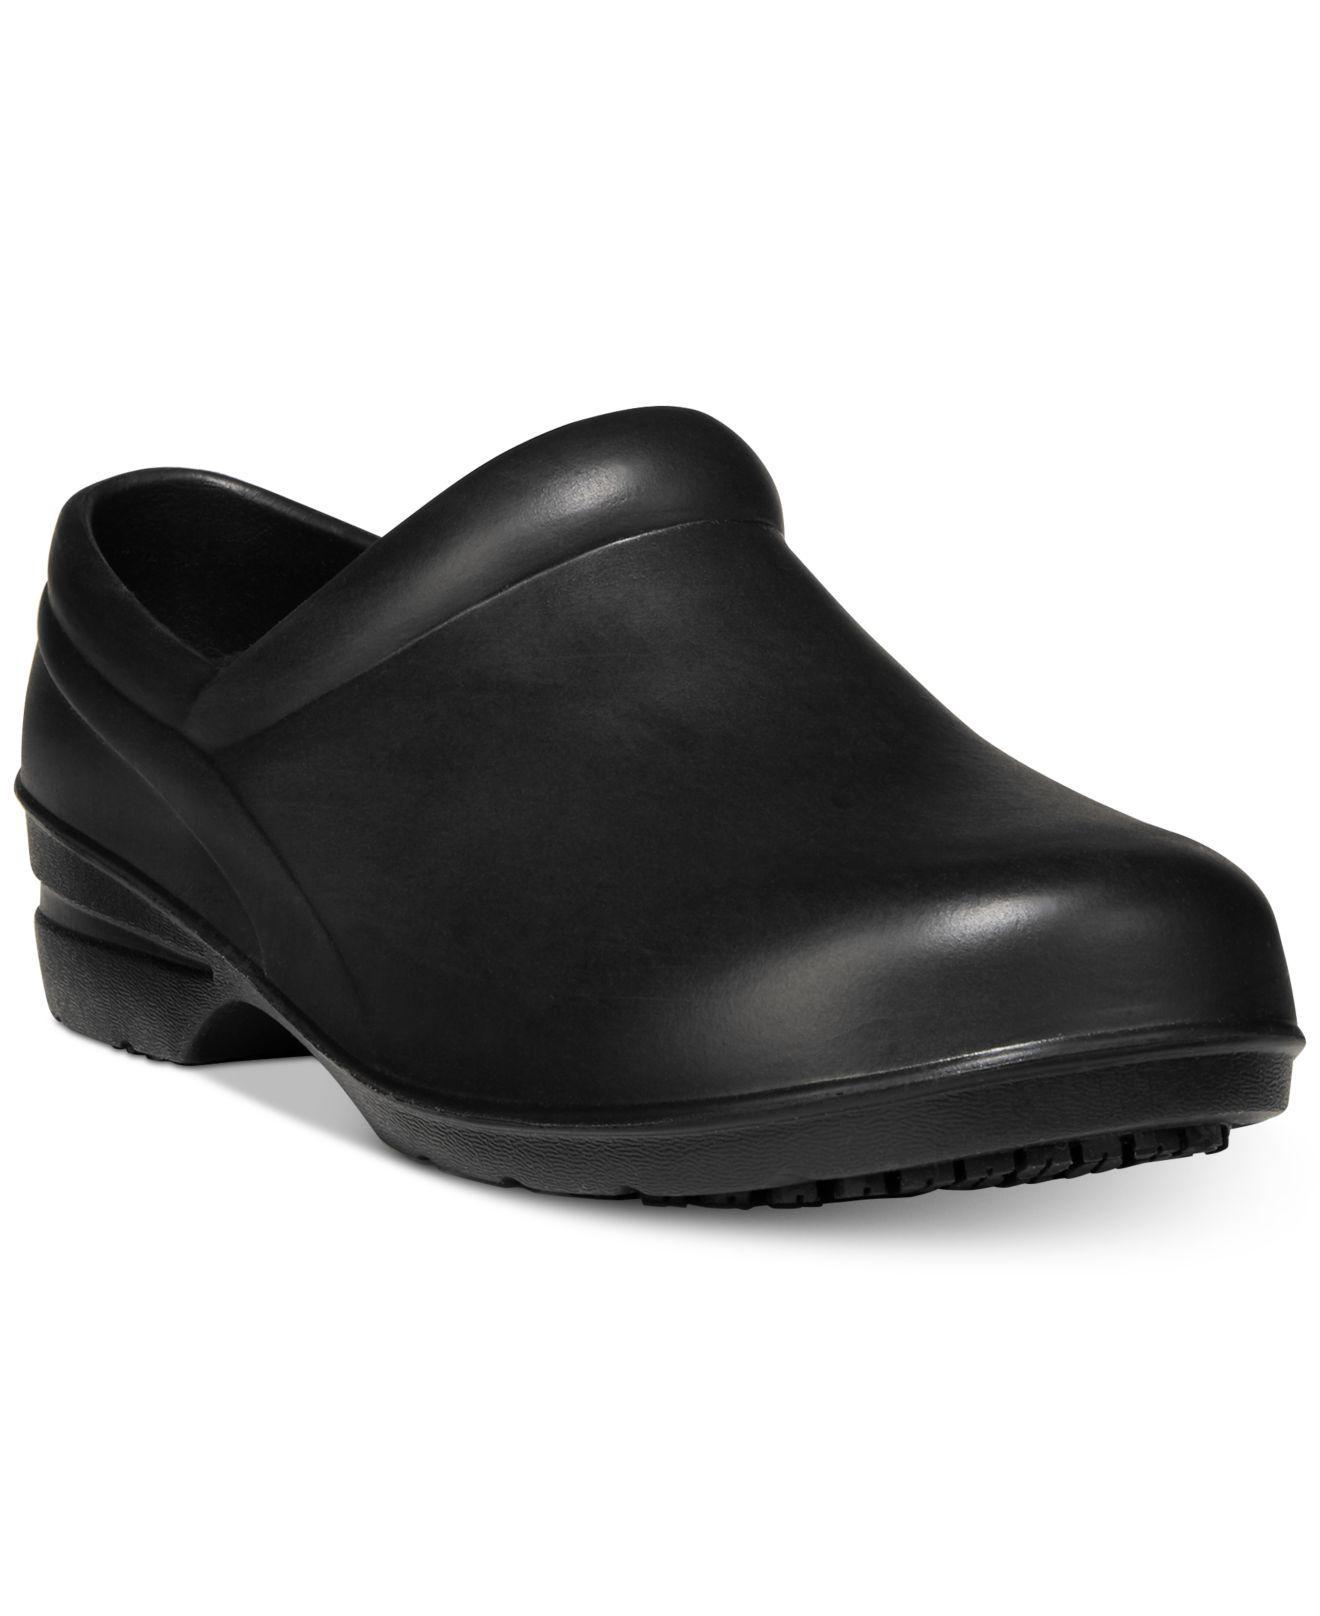 Easy Street Easy Works by Kris Slip-Resistant Clogs Women's Shoes